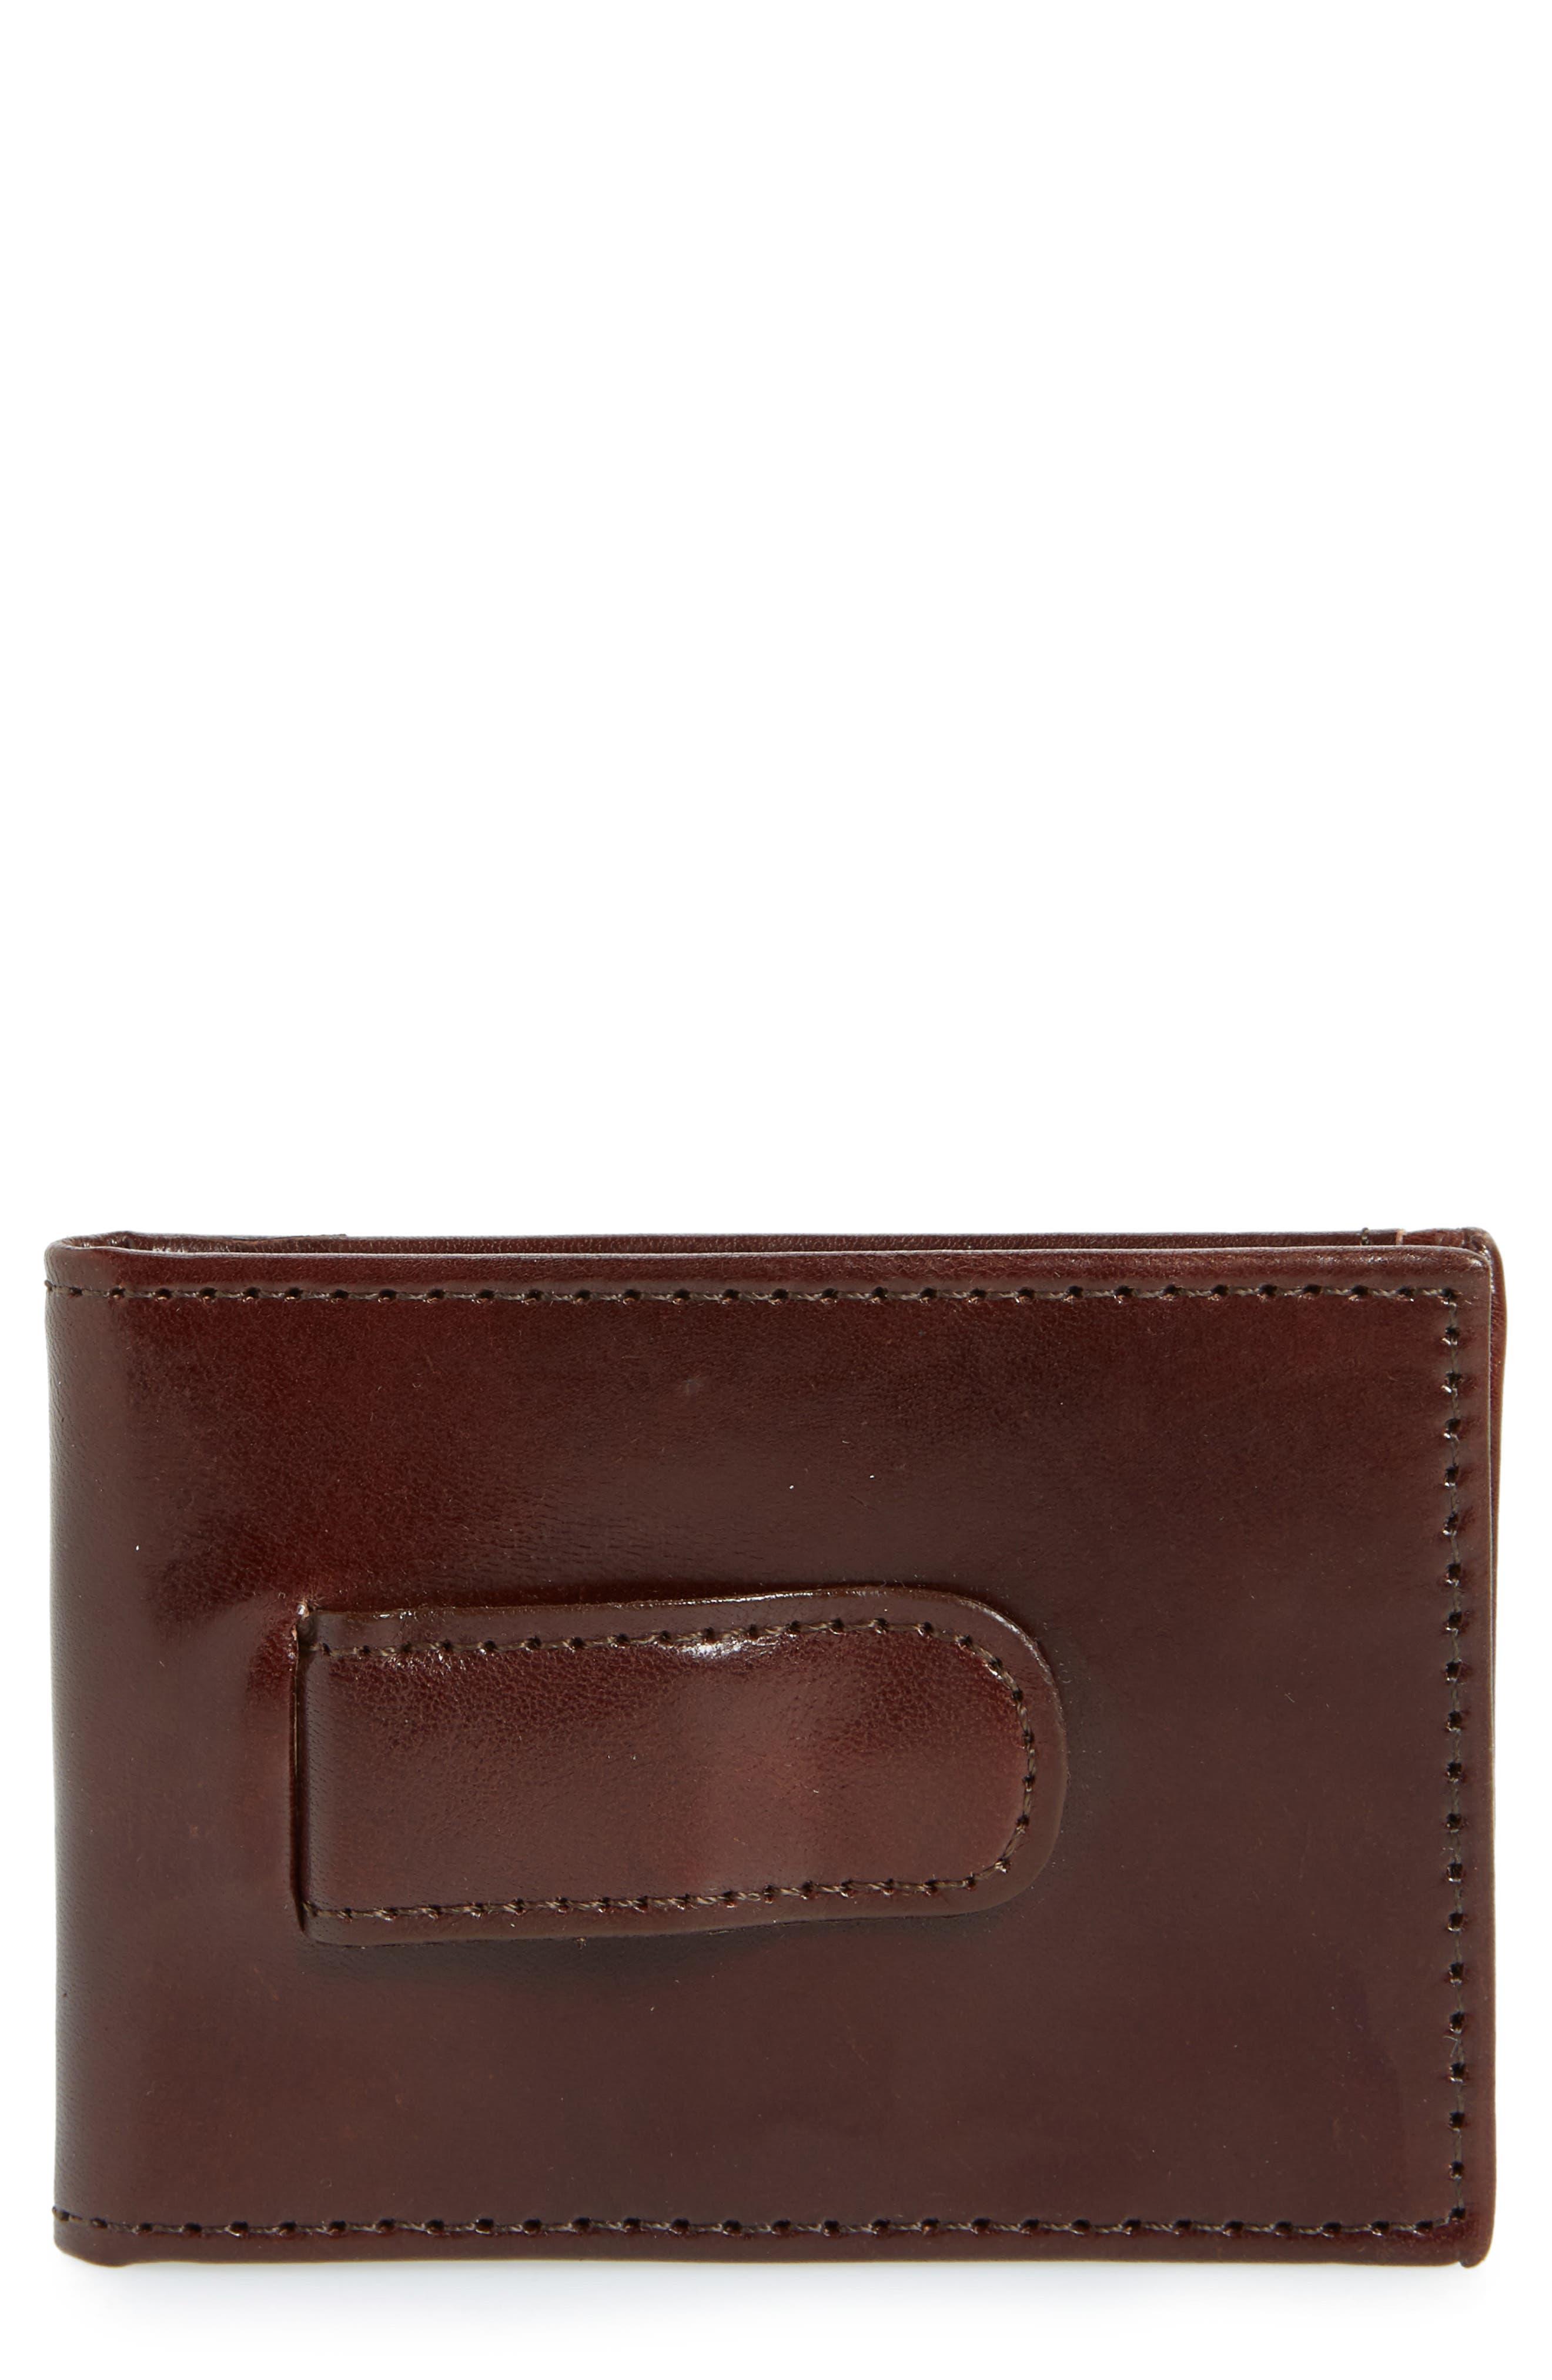 Leather Money Clip Wallet,                             Main thumbnail 1, color,                             BROWN